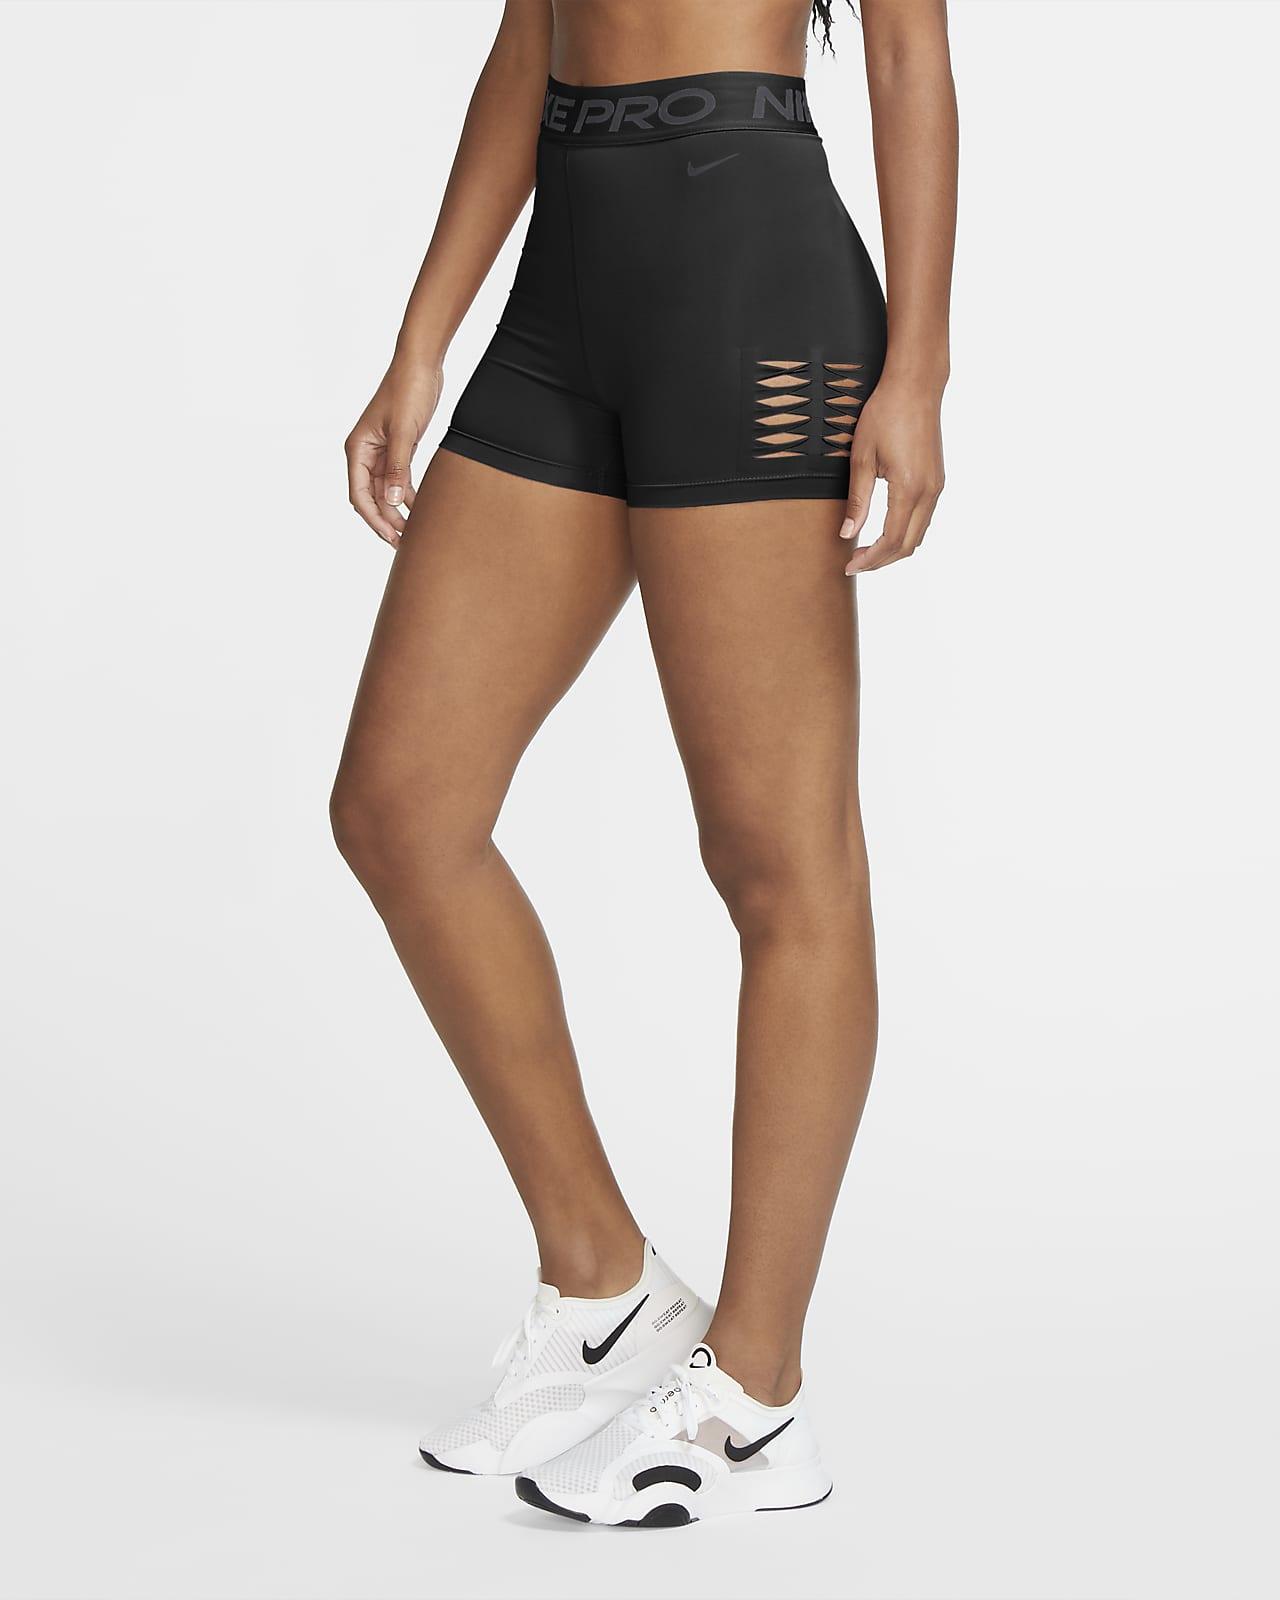 grava Disciplinario Cusco  Nike Pro Women's High-Waisted Shorts. Nike.com